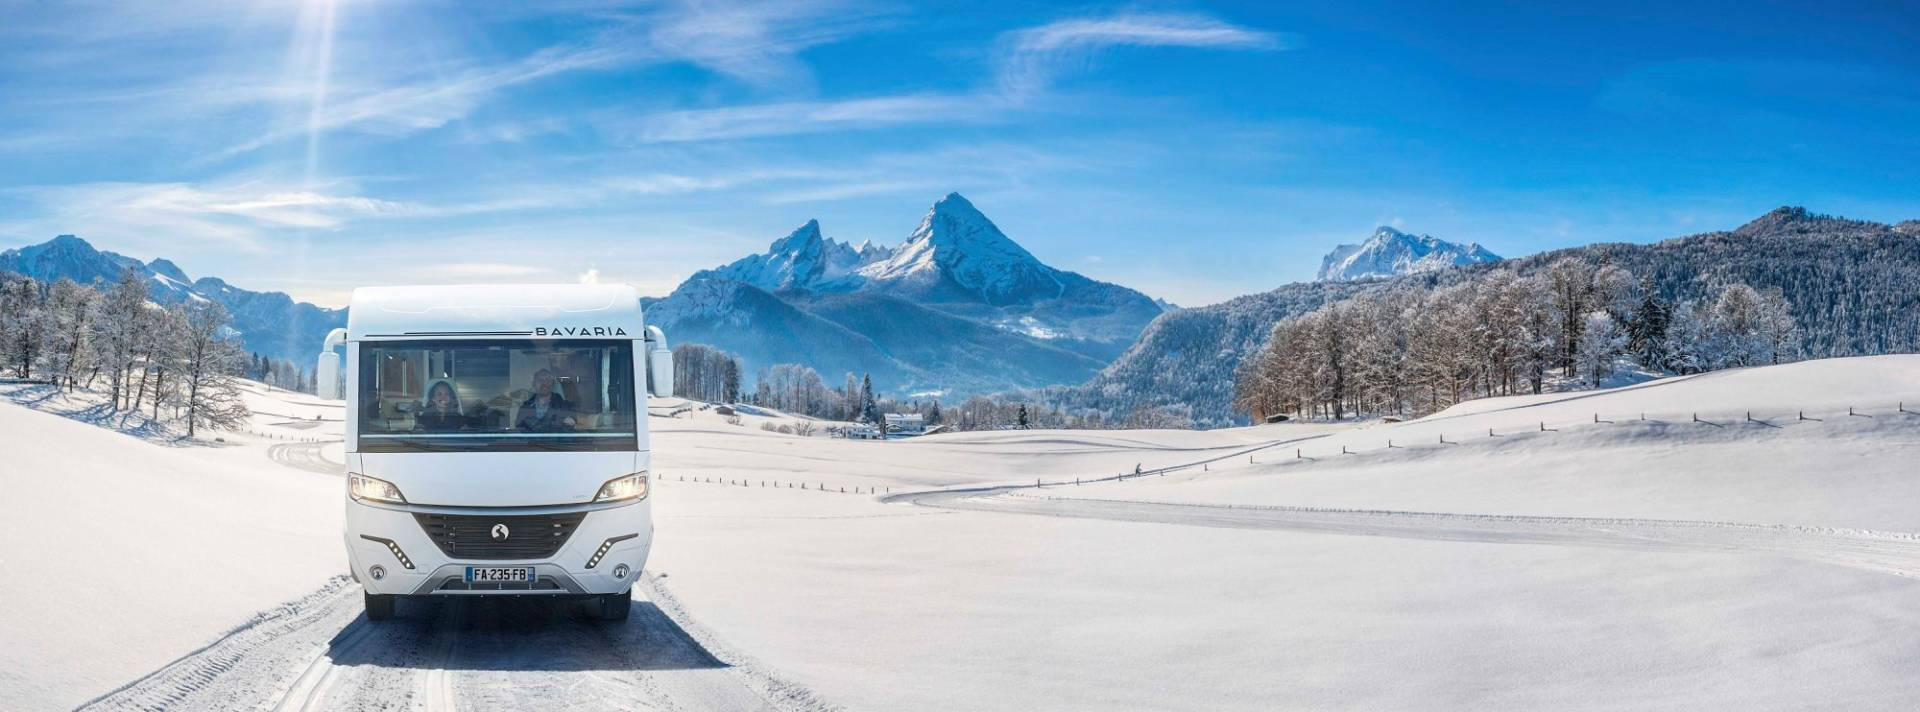 camping-car au ski